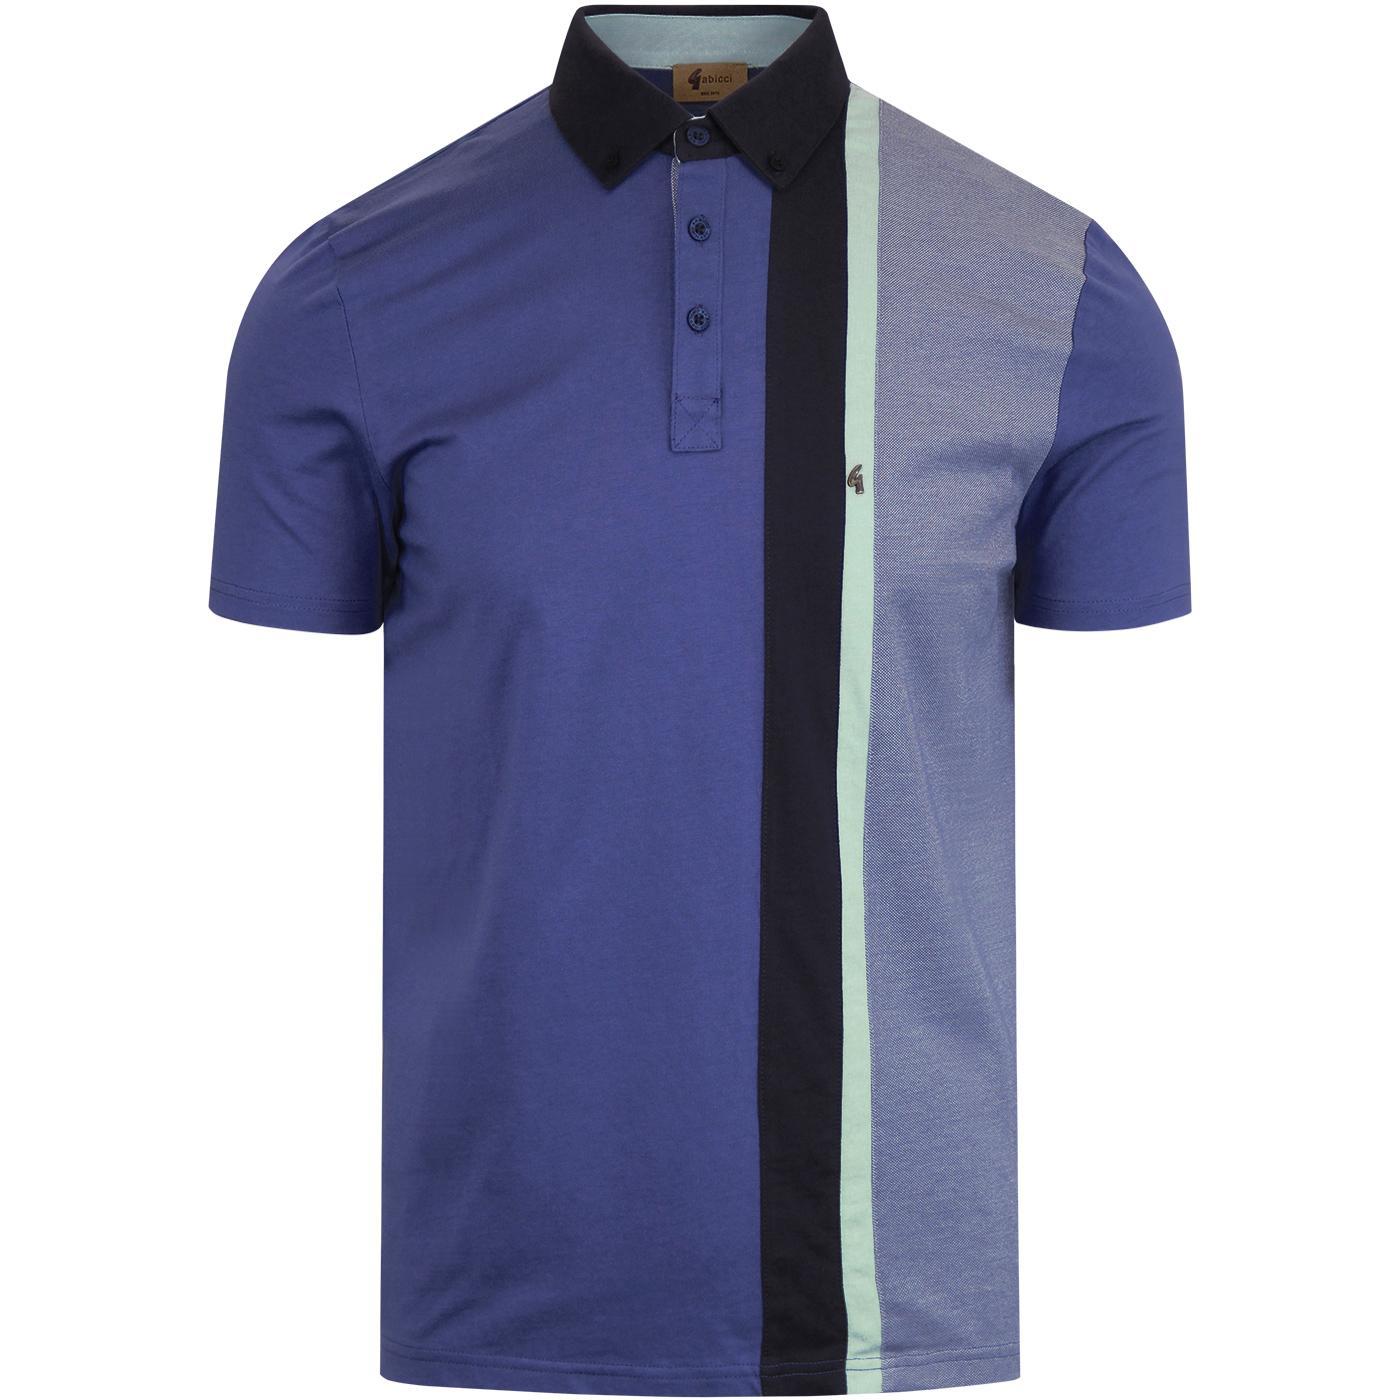 Landau GABICCI VINTAGE Retro Cut & Sew Stripe Polo